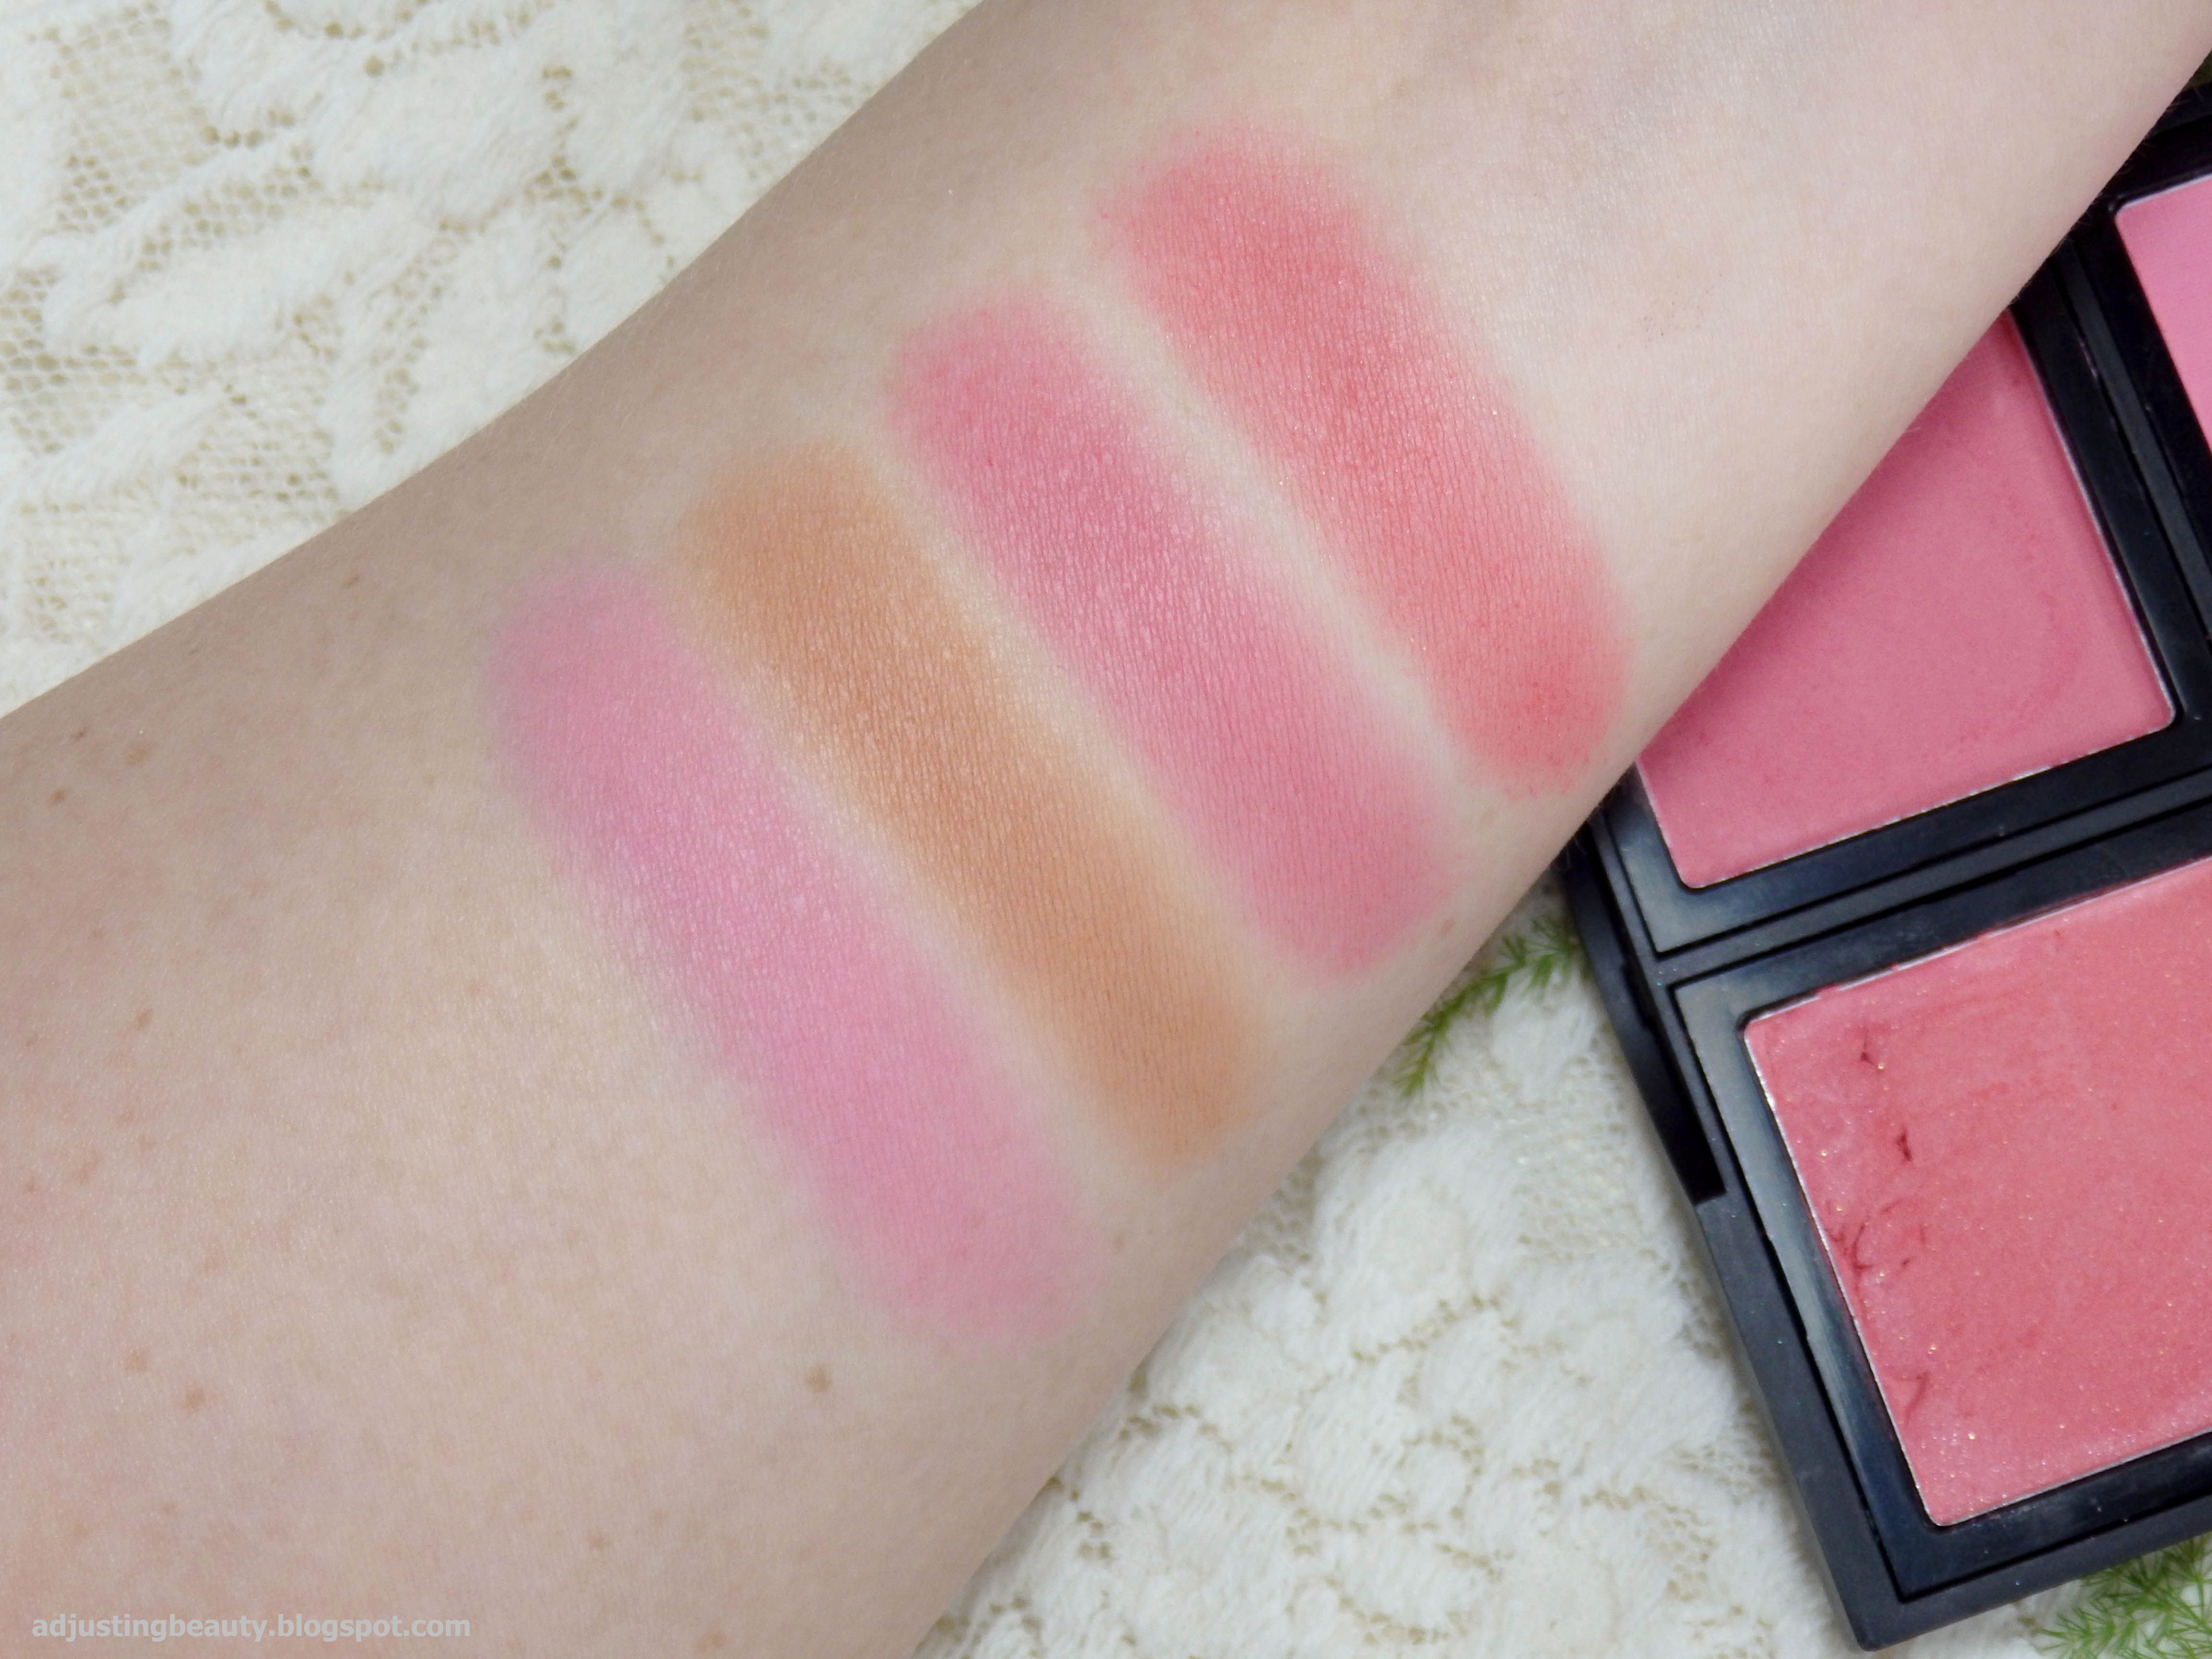 Review Of Elf Blush Palette In Light Pink Orange Peach Makeup